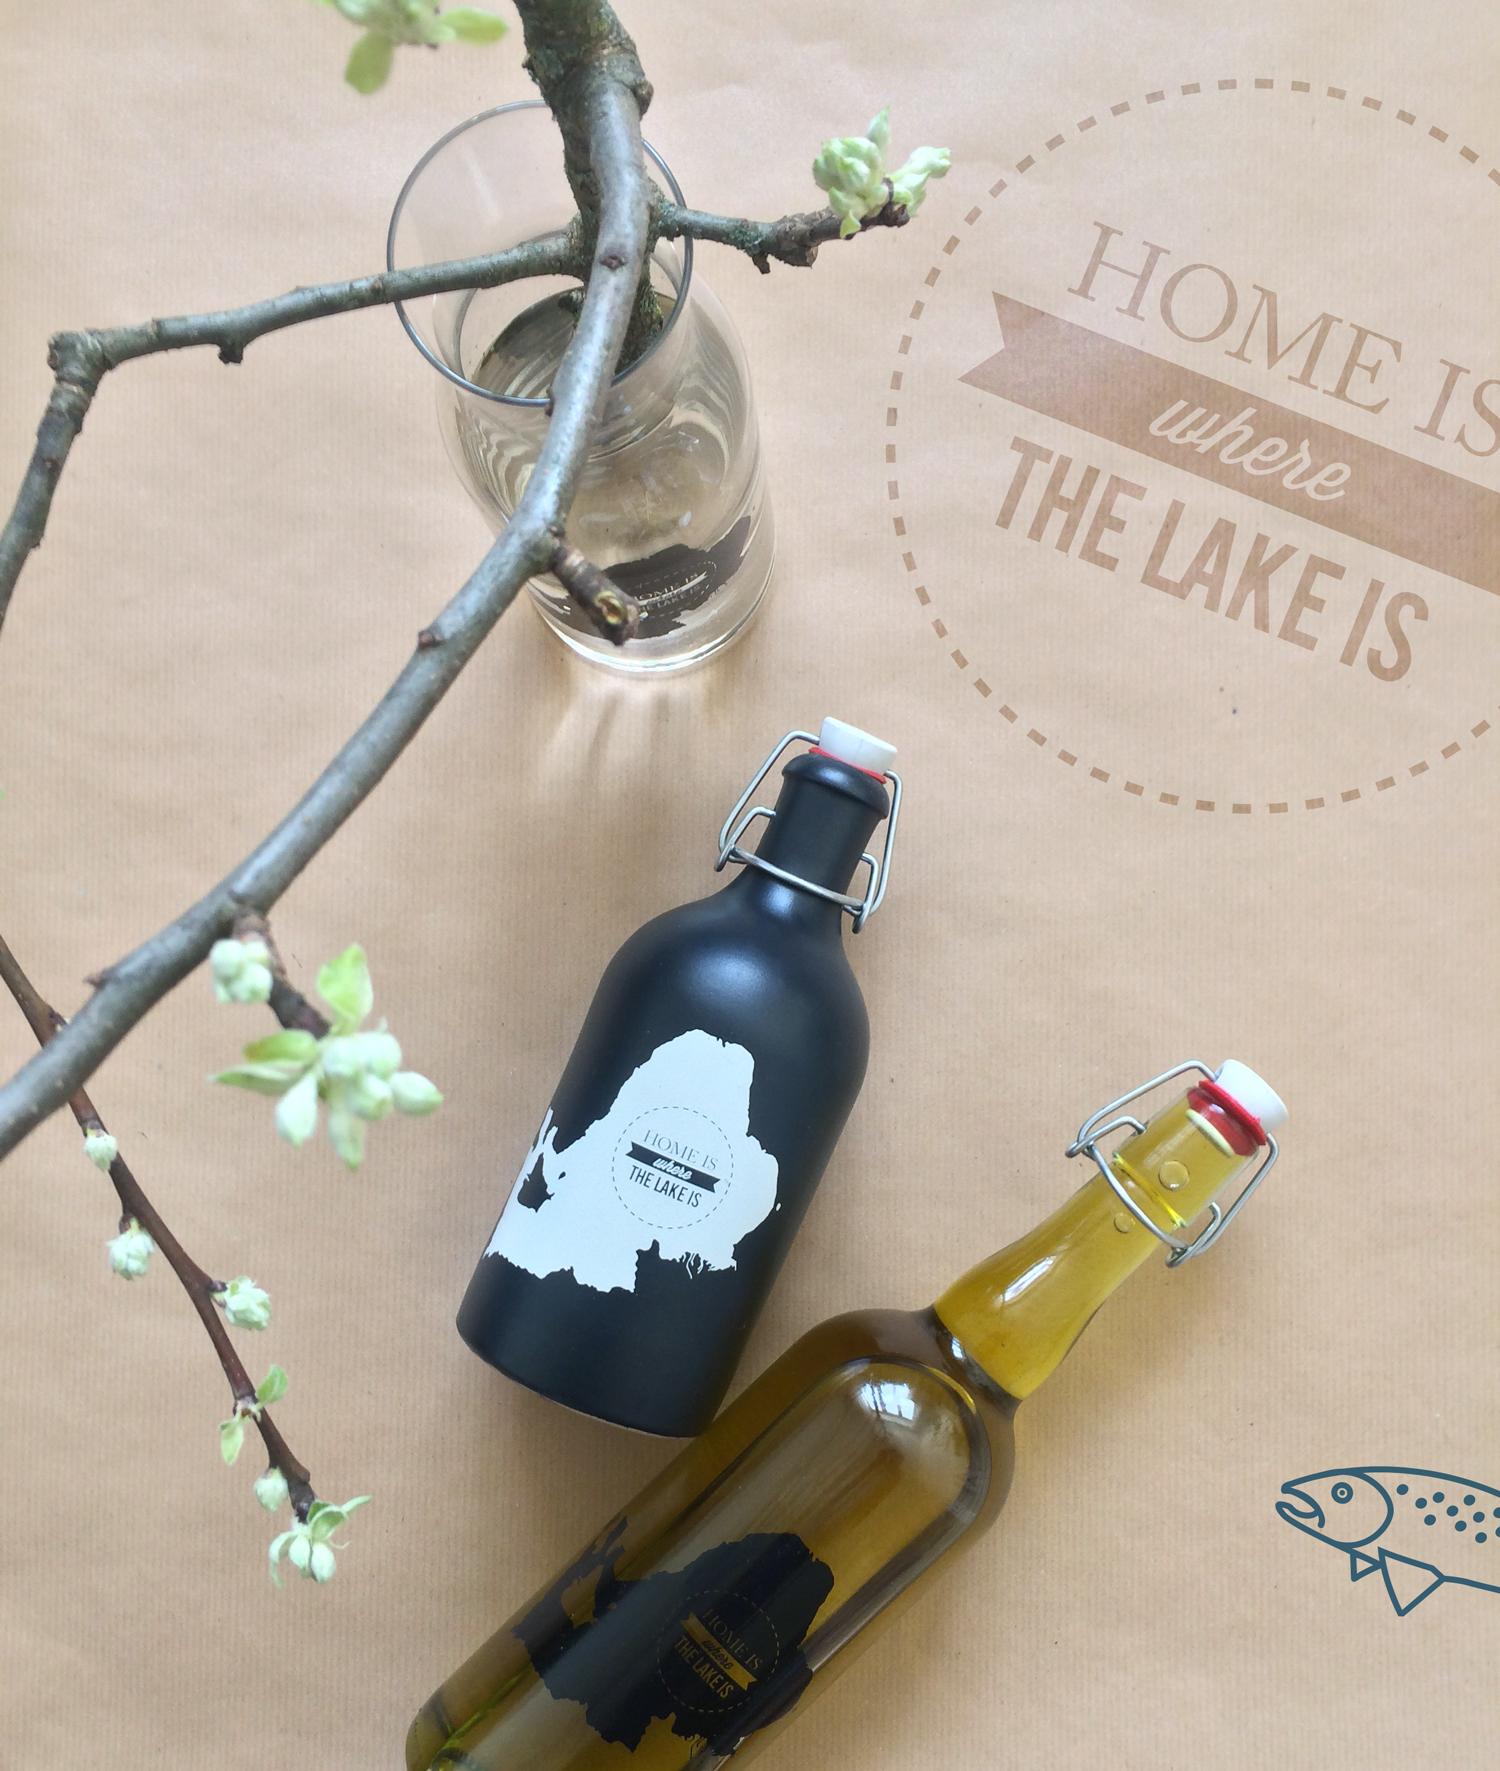 Home_is_where_the-_Lake_is_bottles_Michael-Seidl-Design.jpg